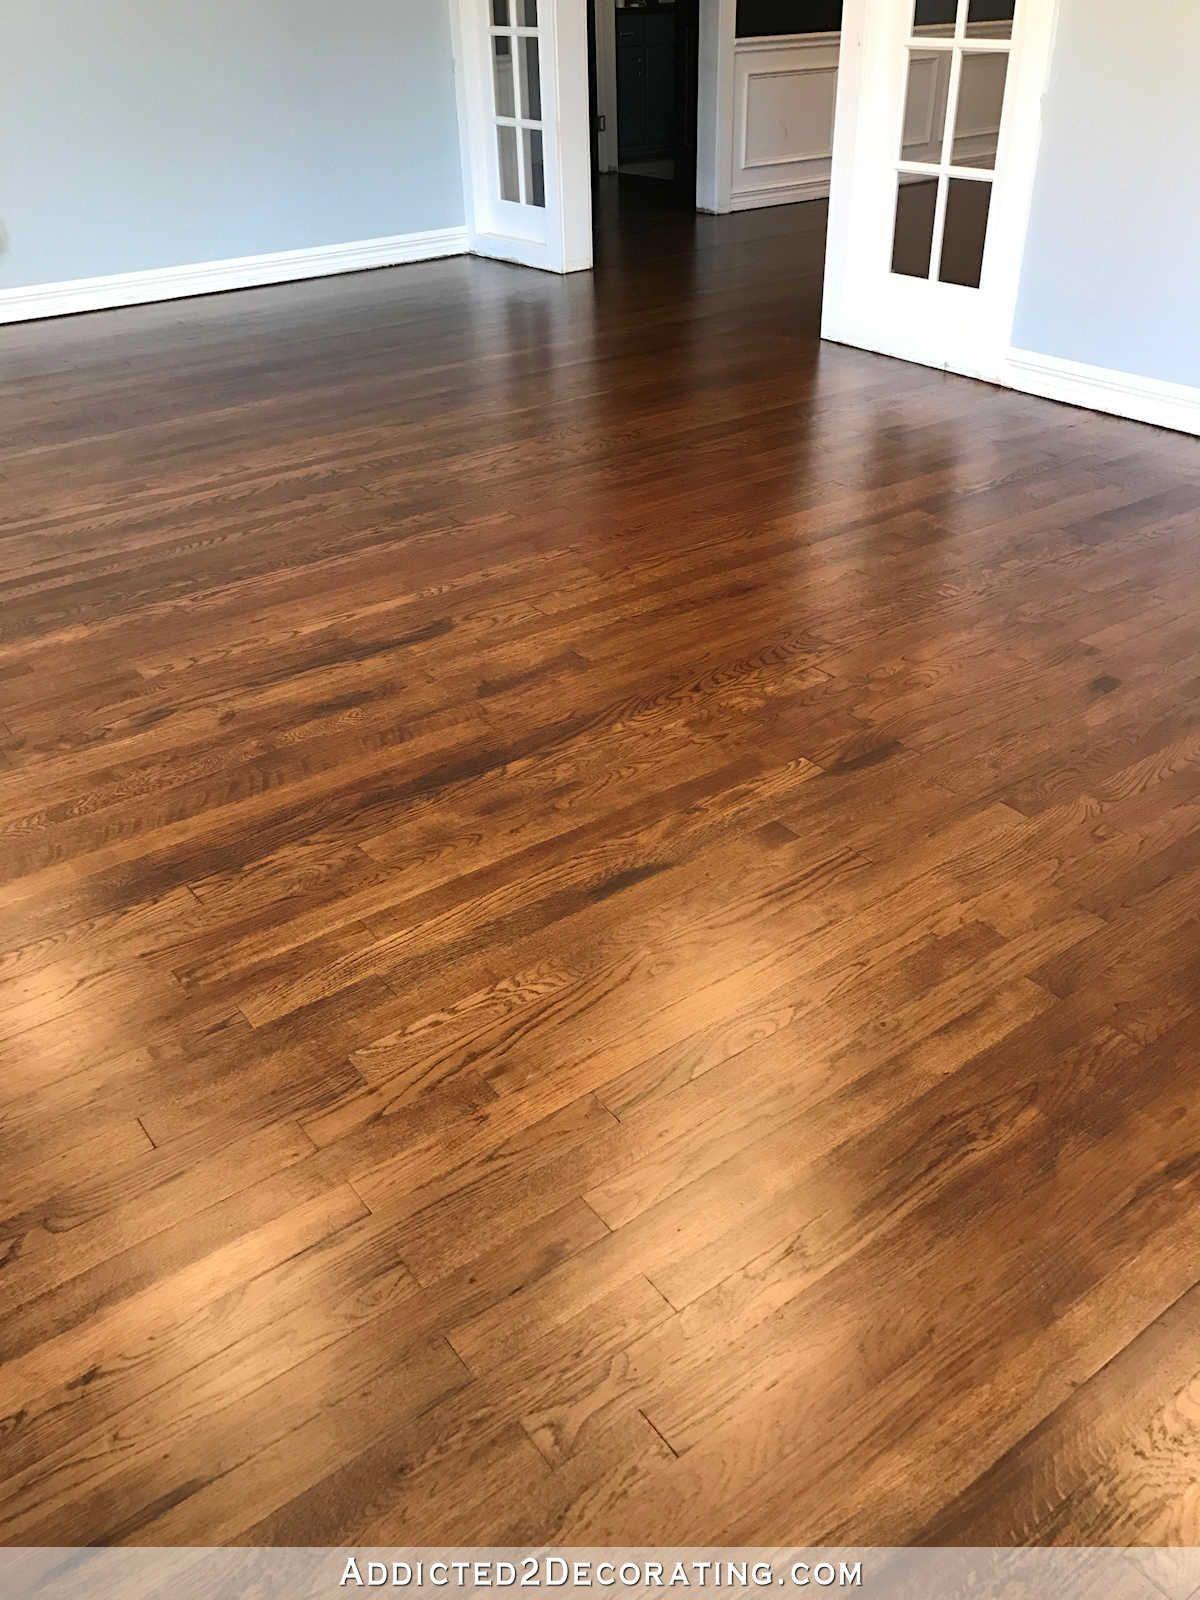 Red Oak Hardwood Floors in 50/50 mix of Minwax Dark Walnut